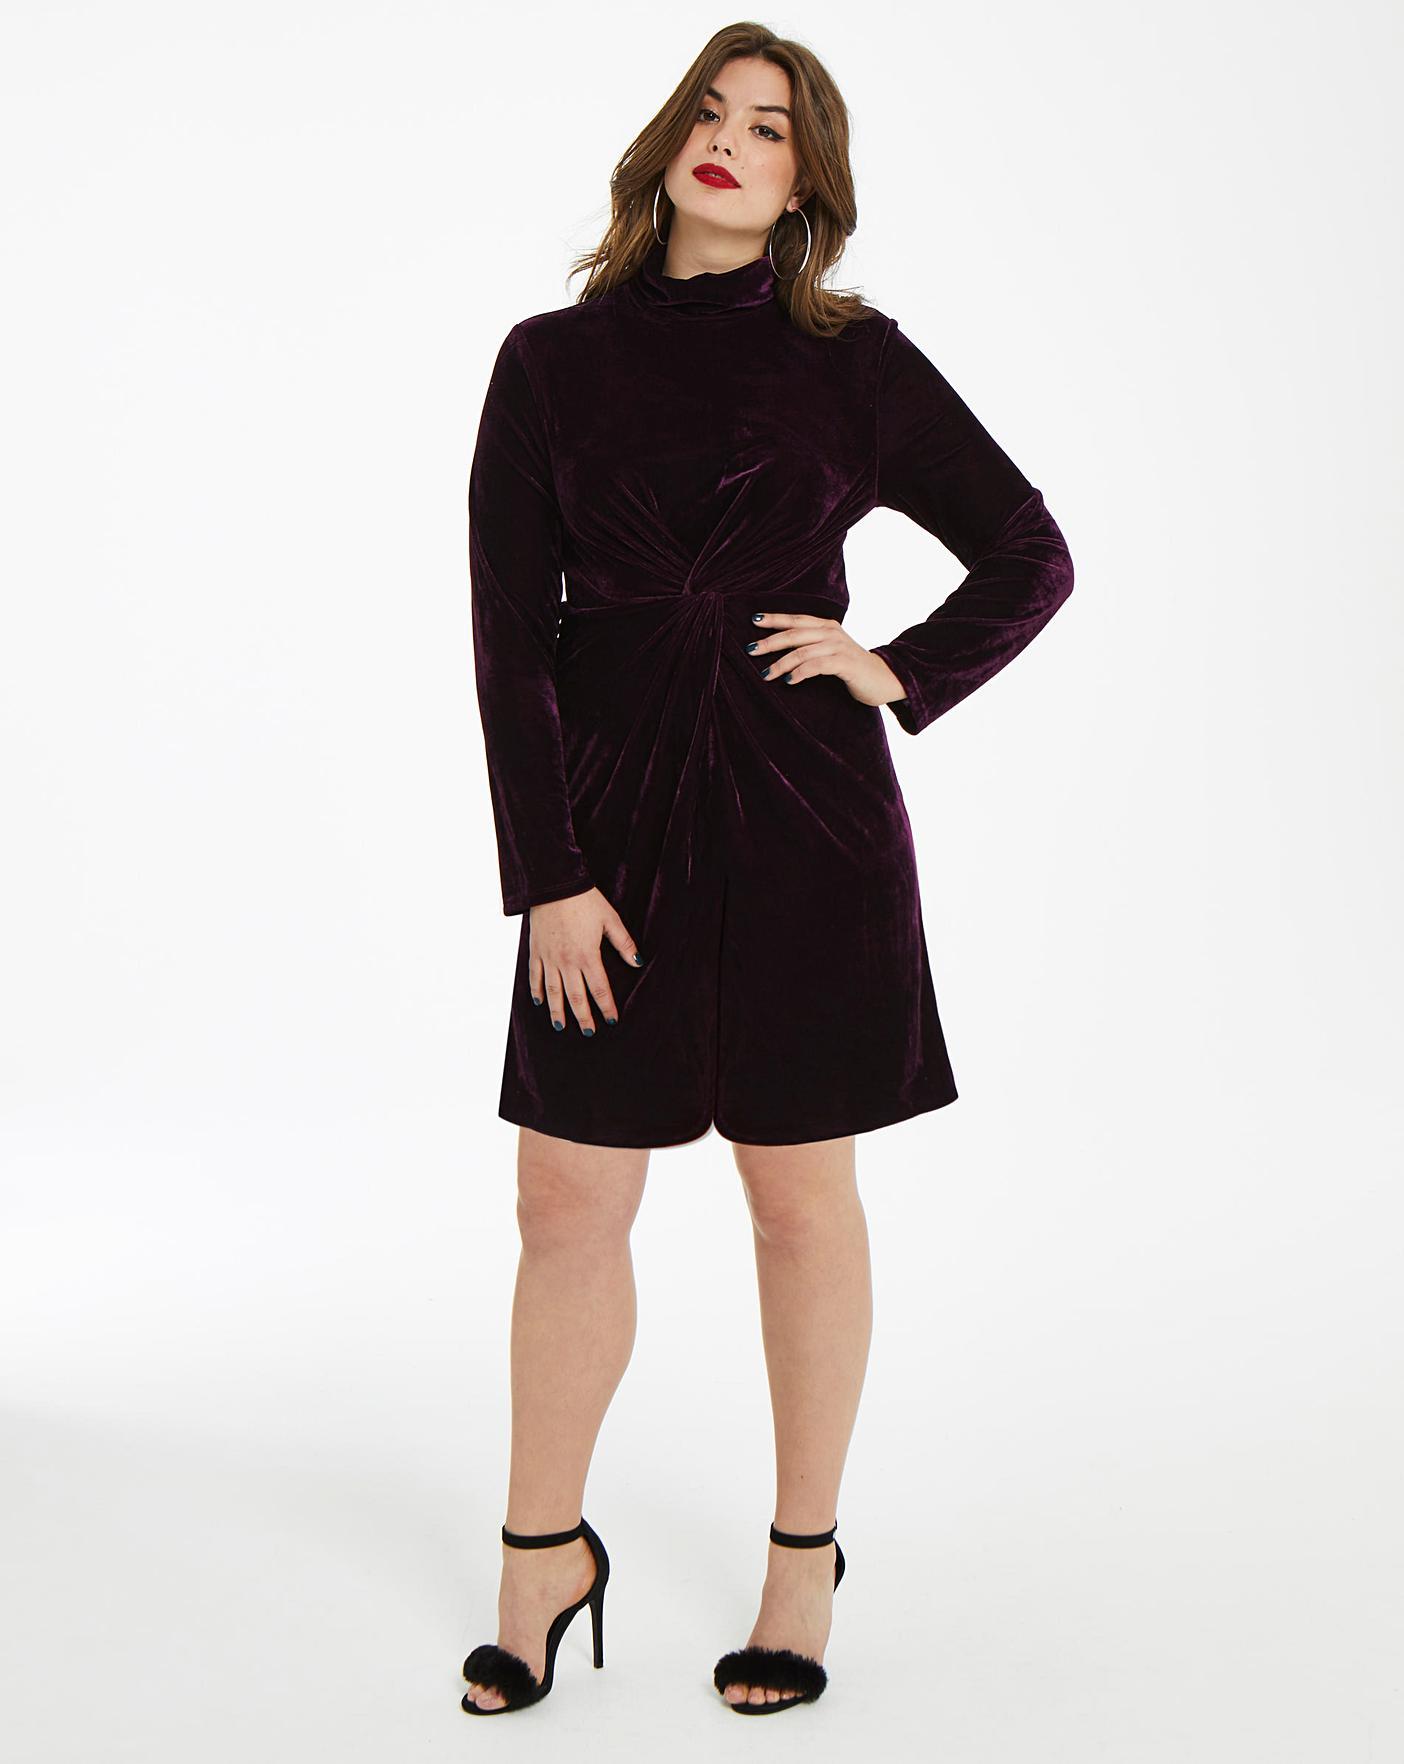 A bordo chiarezza Pasqua  Fashion Union Twist Knot Velvet Dress | Simply Be